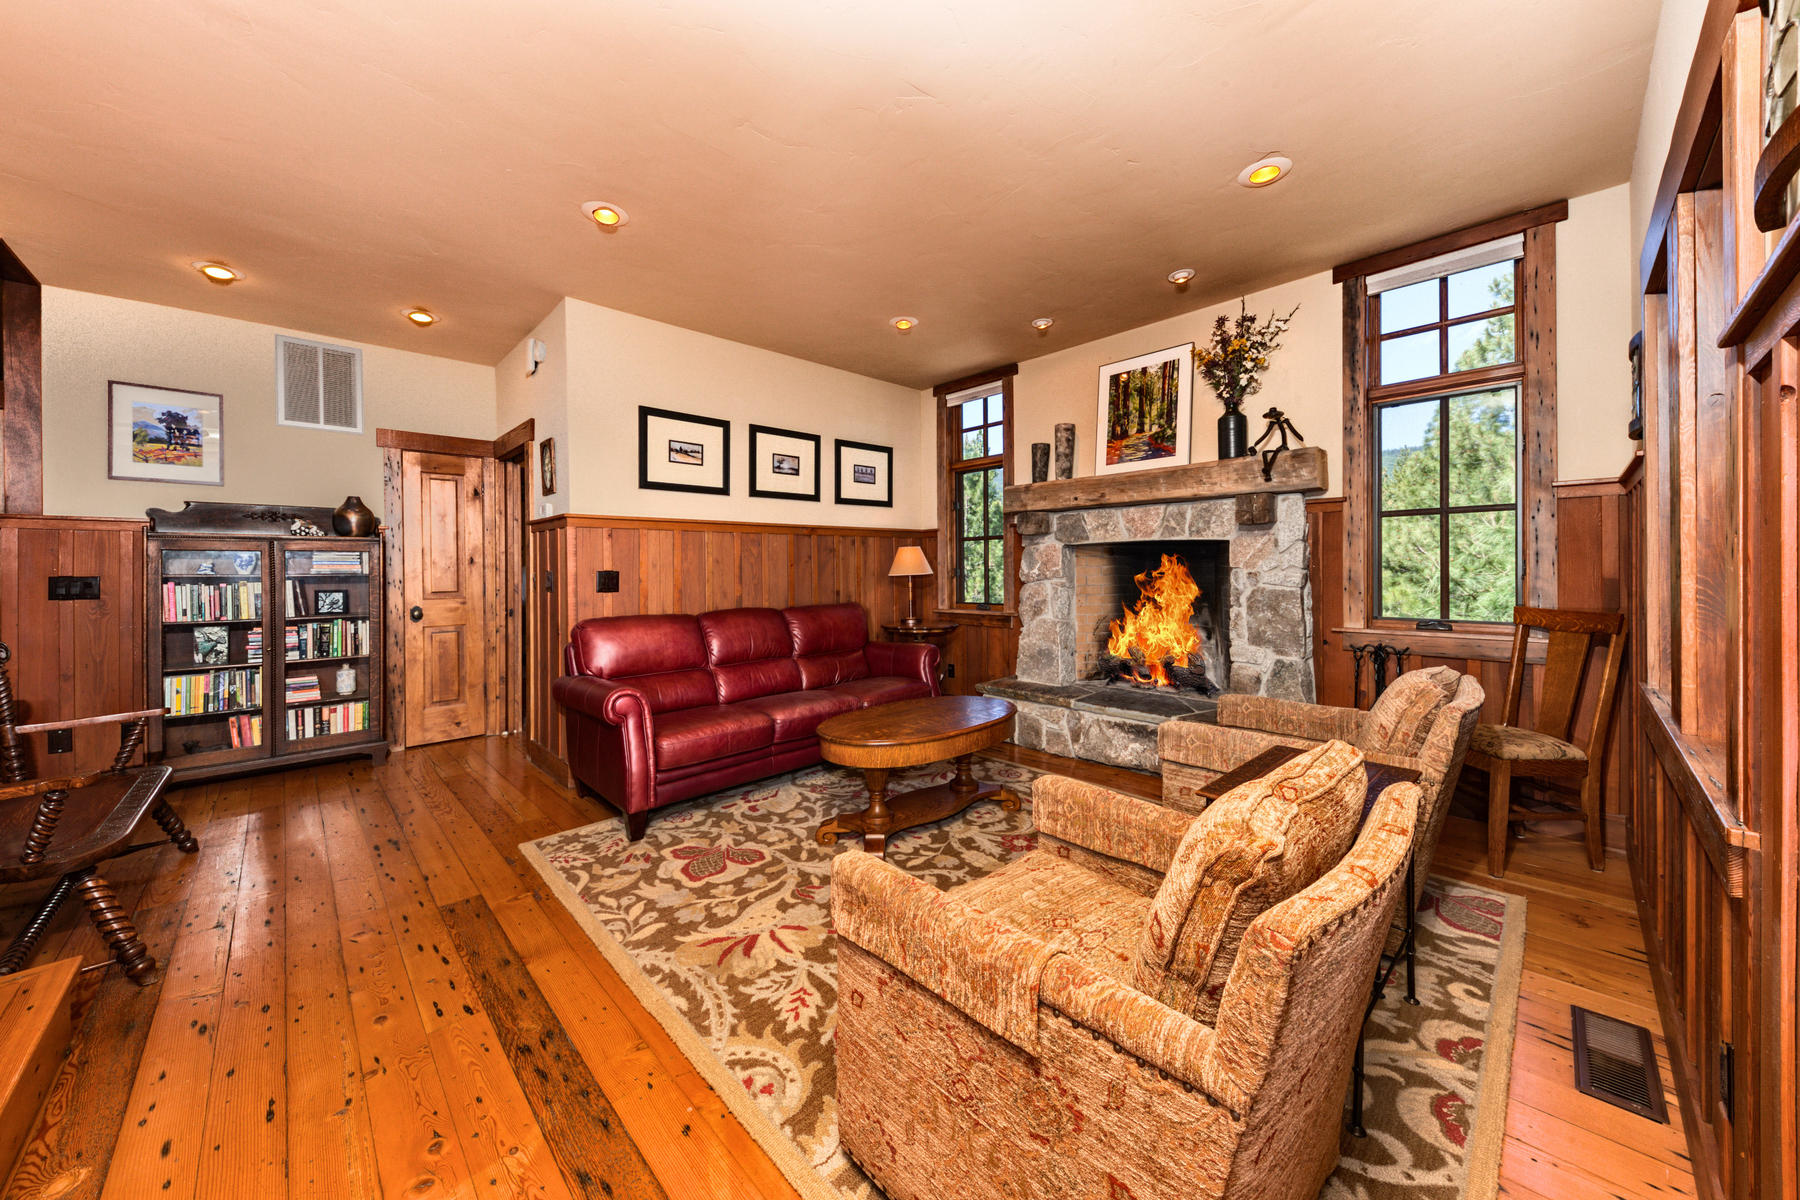 Additional photo for property listing at 428 W Willow St., Sierraville, CA 428 W Willow St. Sierraville, California 96126 Estados Unidos